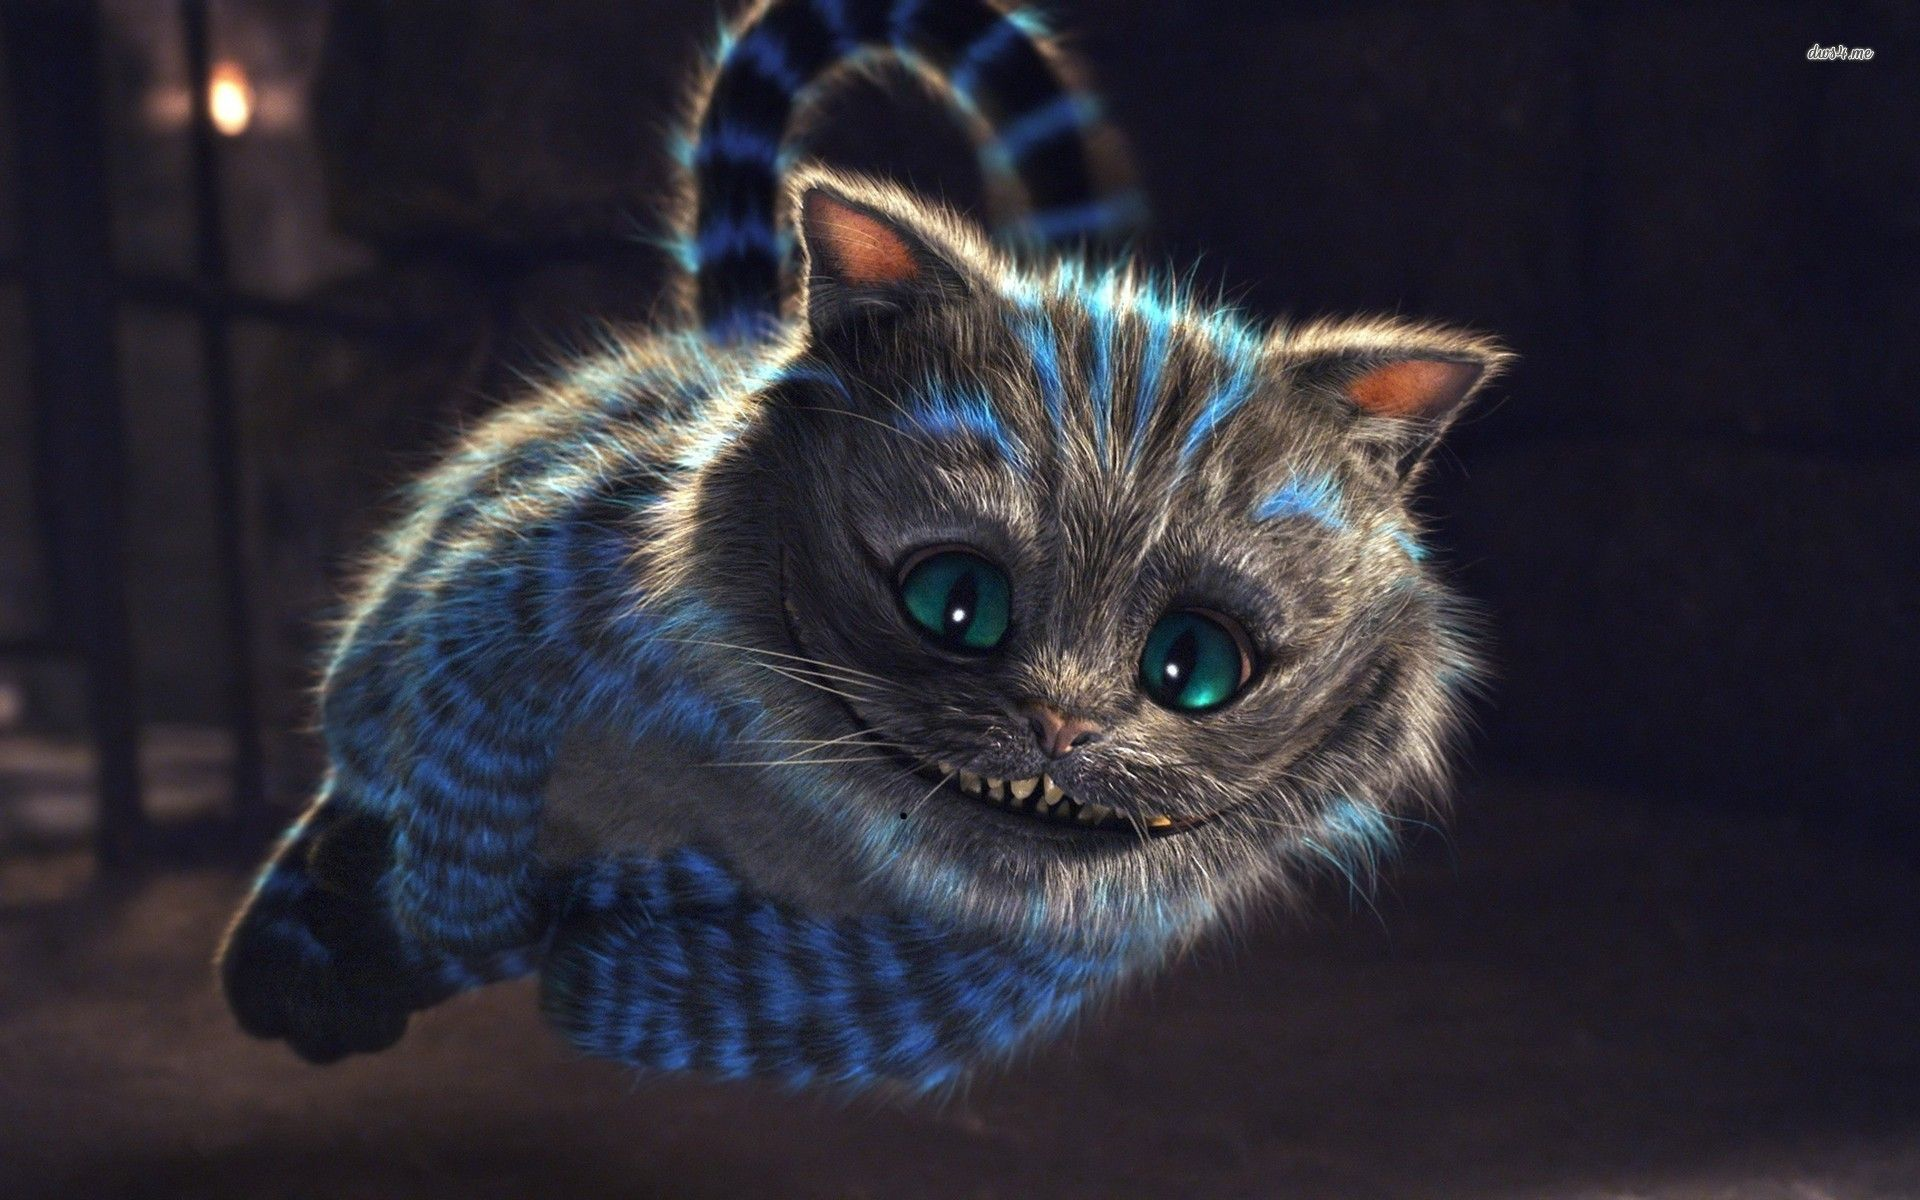 45 Cheshire Cat Wallpaper For Laptop On Wallpapersafari